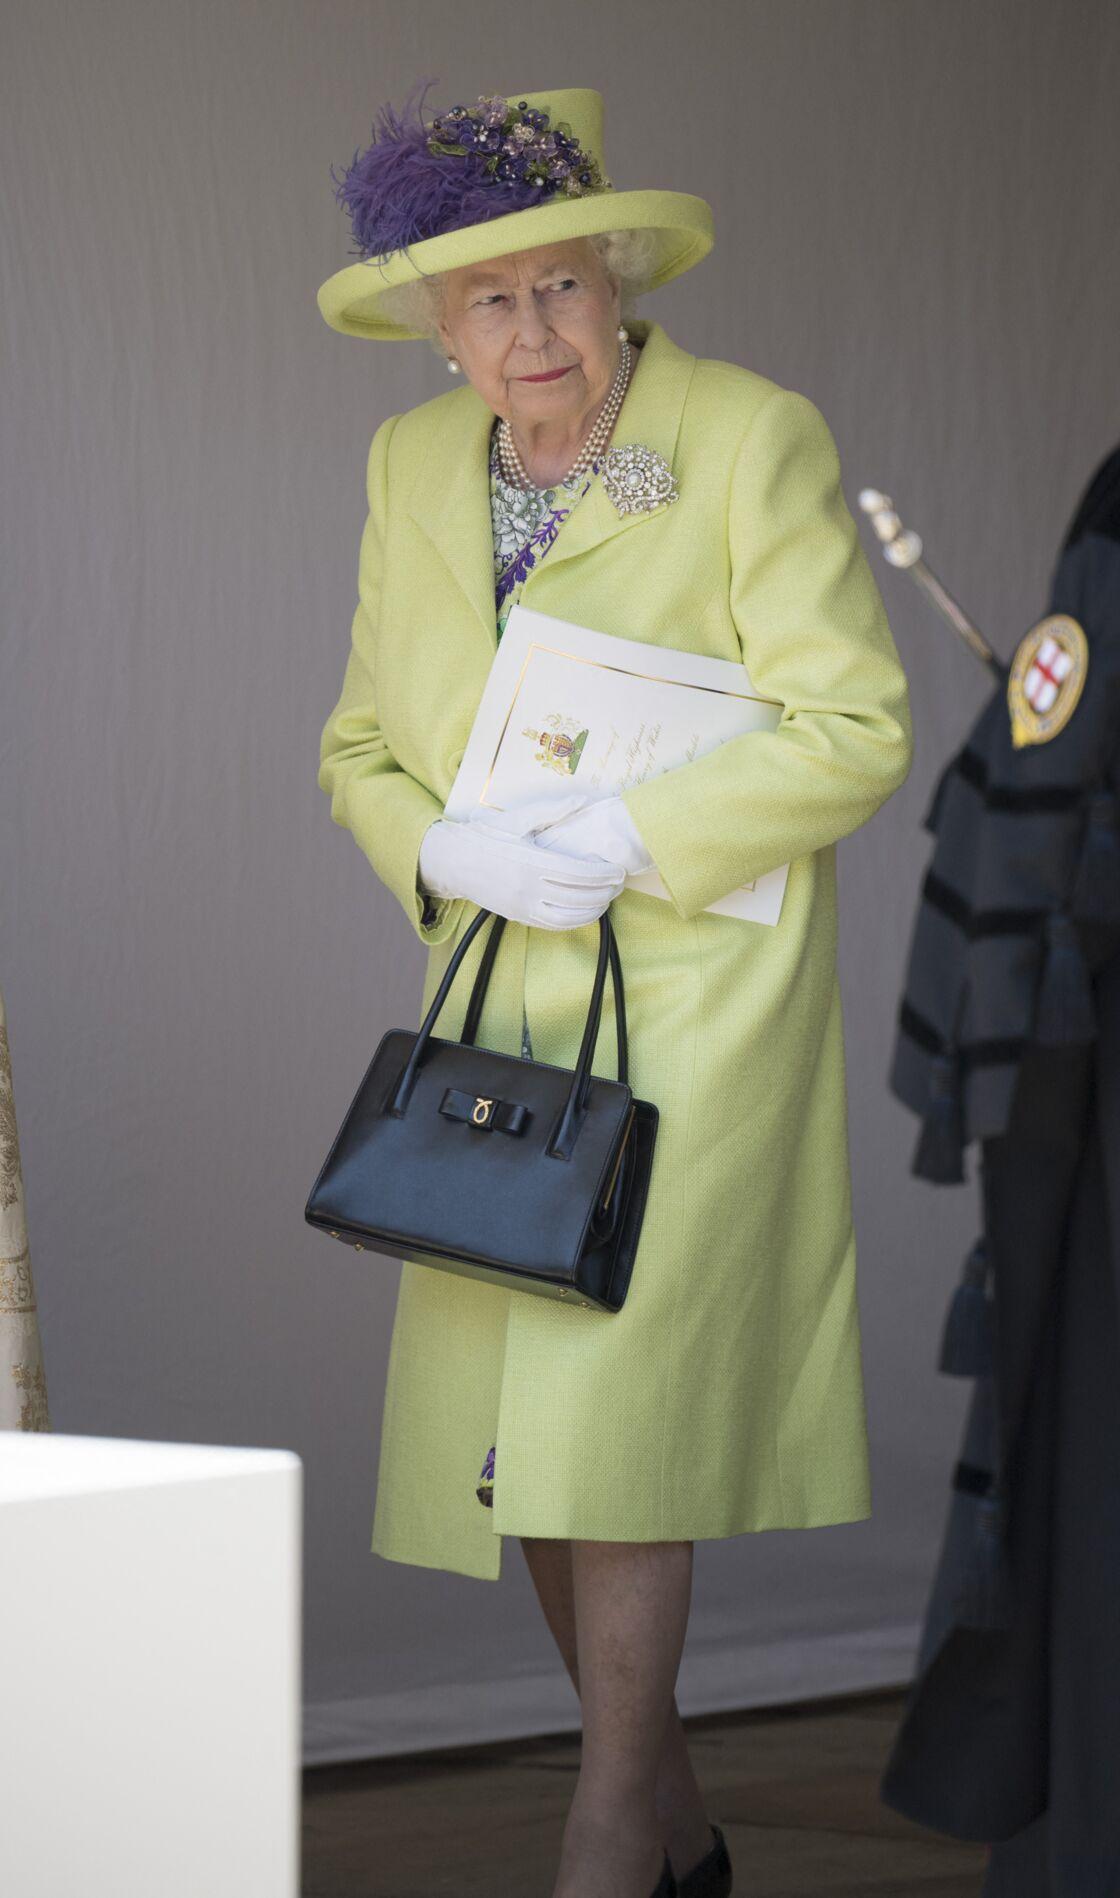 La reine Elizabeth II au mariage de Meghan Markle et du prince Harry